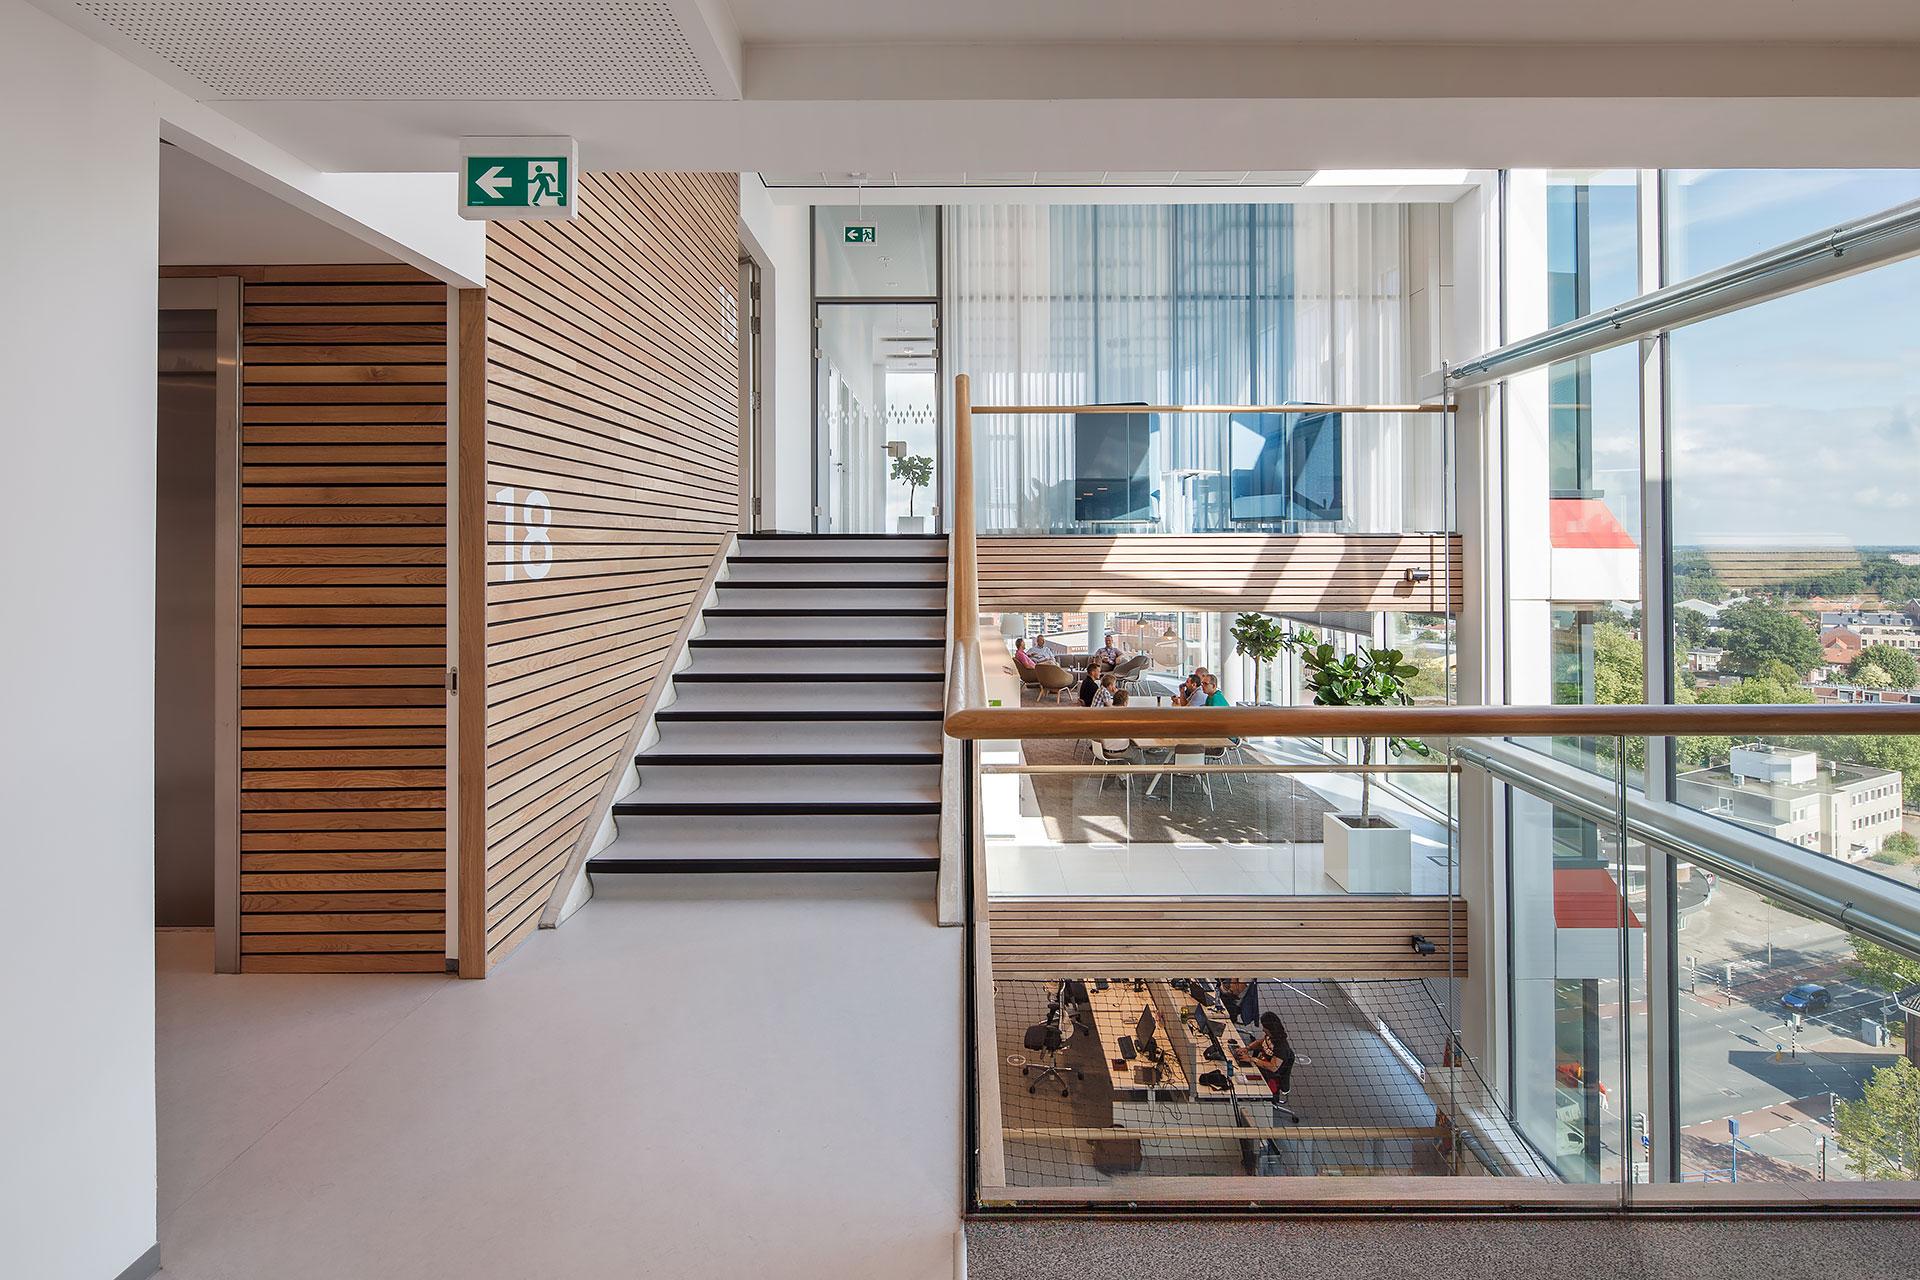 SP2015-Stadhuis-Almelo-architectuurfoto-14